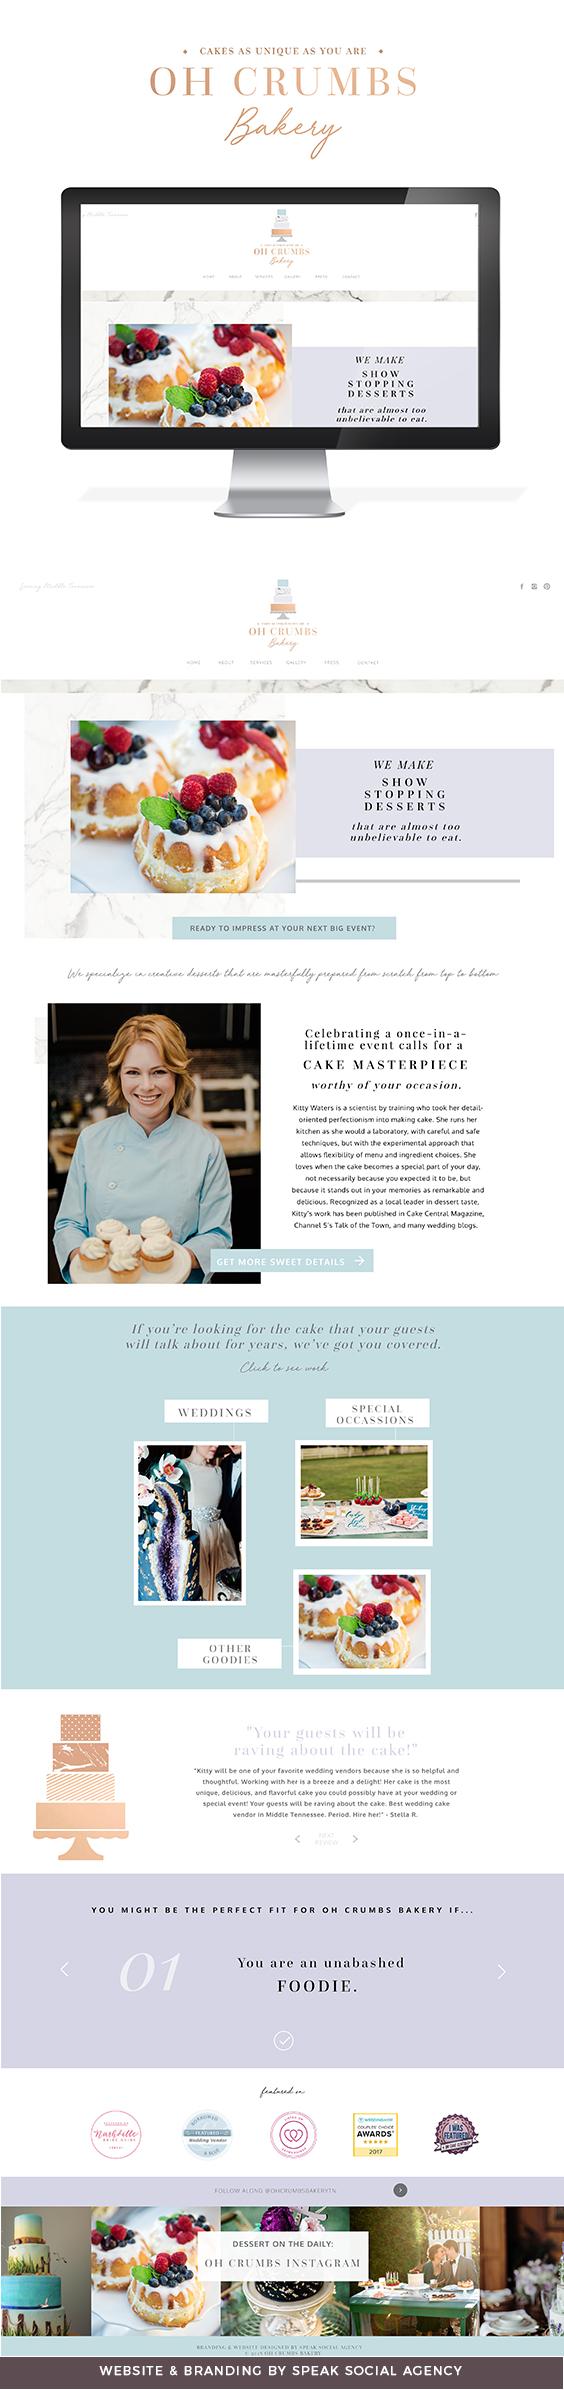 Client-Website-Pinterest